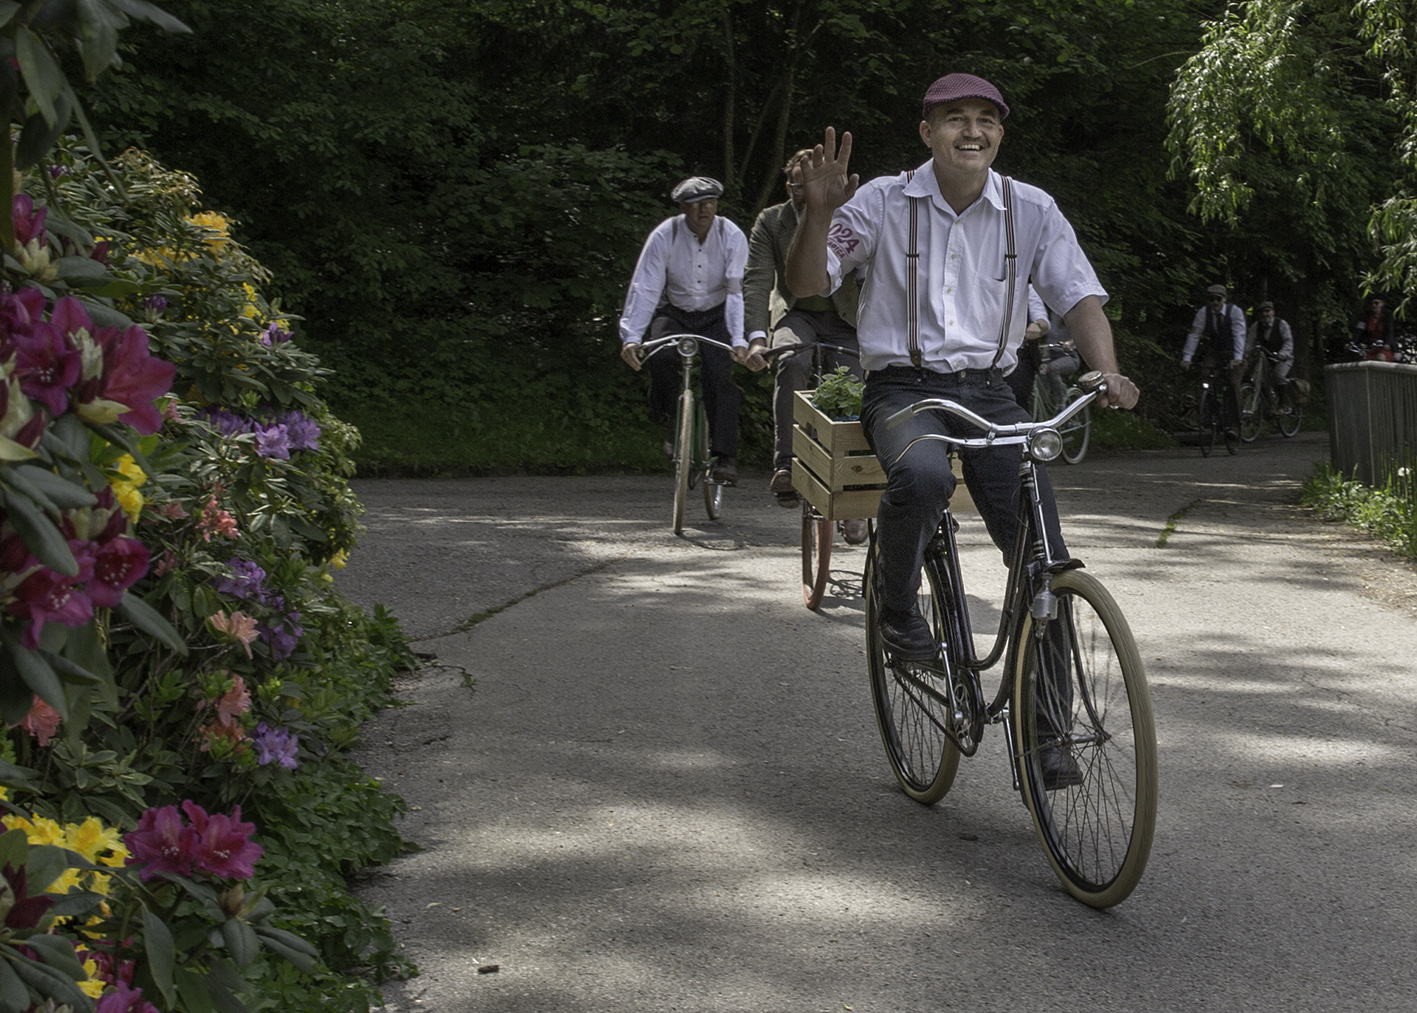 Farradfahrer_375A4458